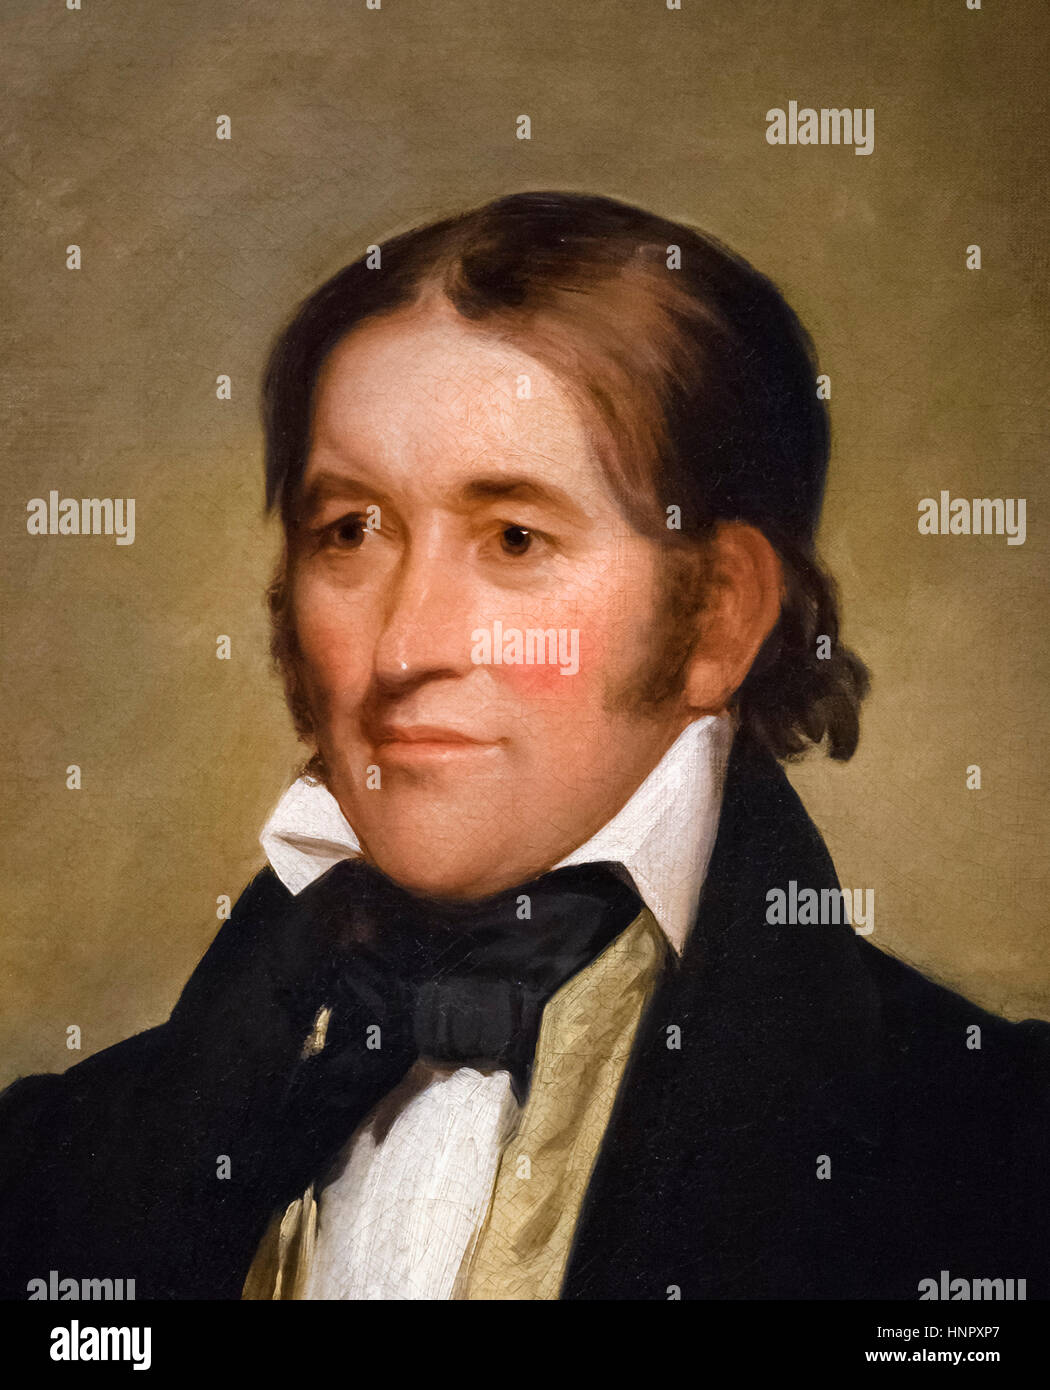 Davy Crockett (1786-1836), portrait by Chester Harding, oil on canvas, 1834. Davy Crockett, 'King of the Wild - Stock Image